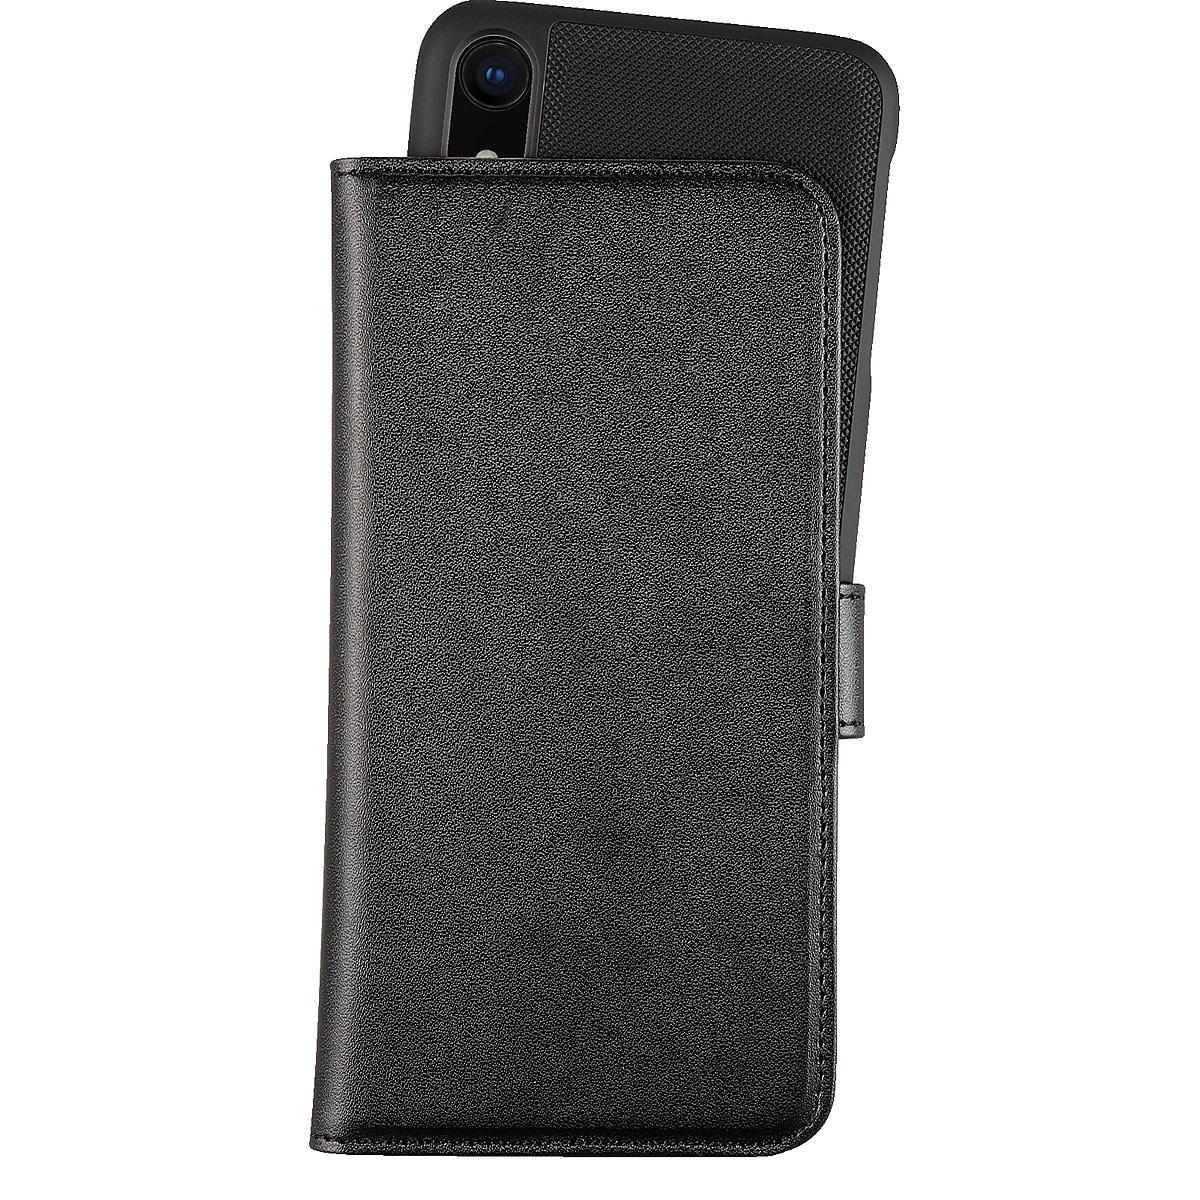 Plånboksfodral för iPhone XS Max, Holdit